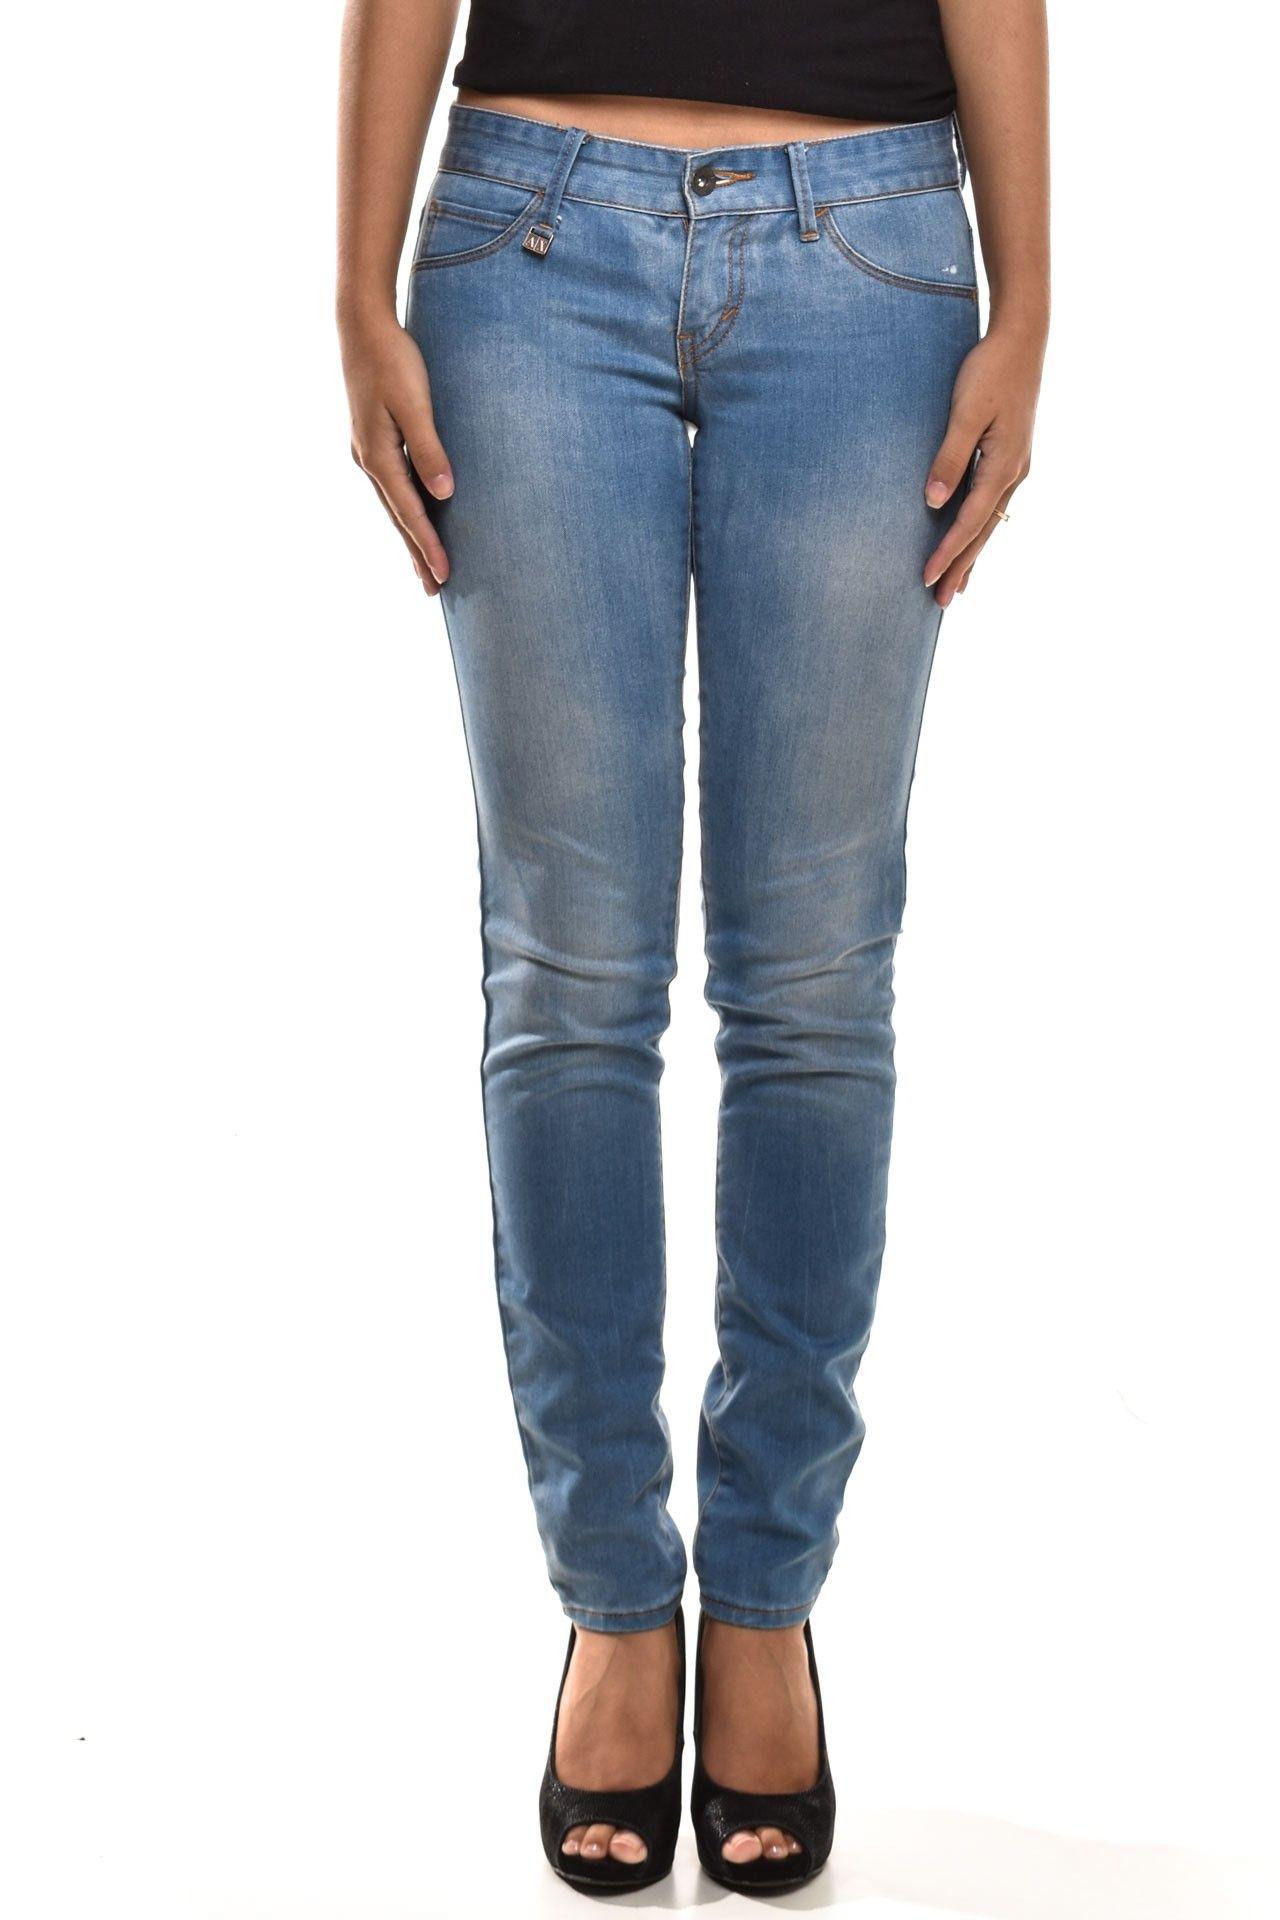 Armani Exchange - Calça Jeans Clara - Foto 1